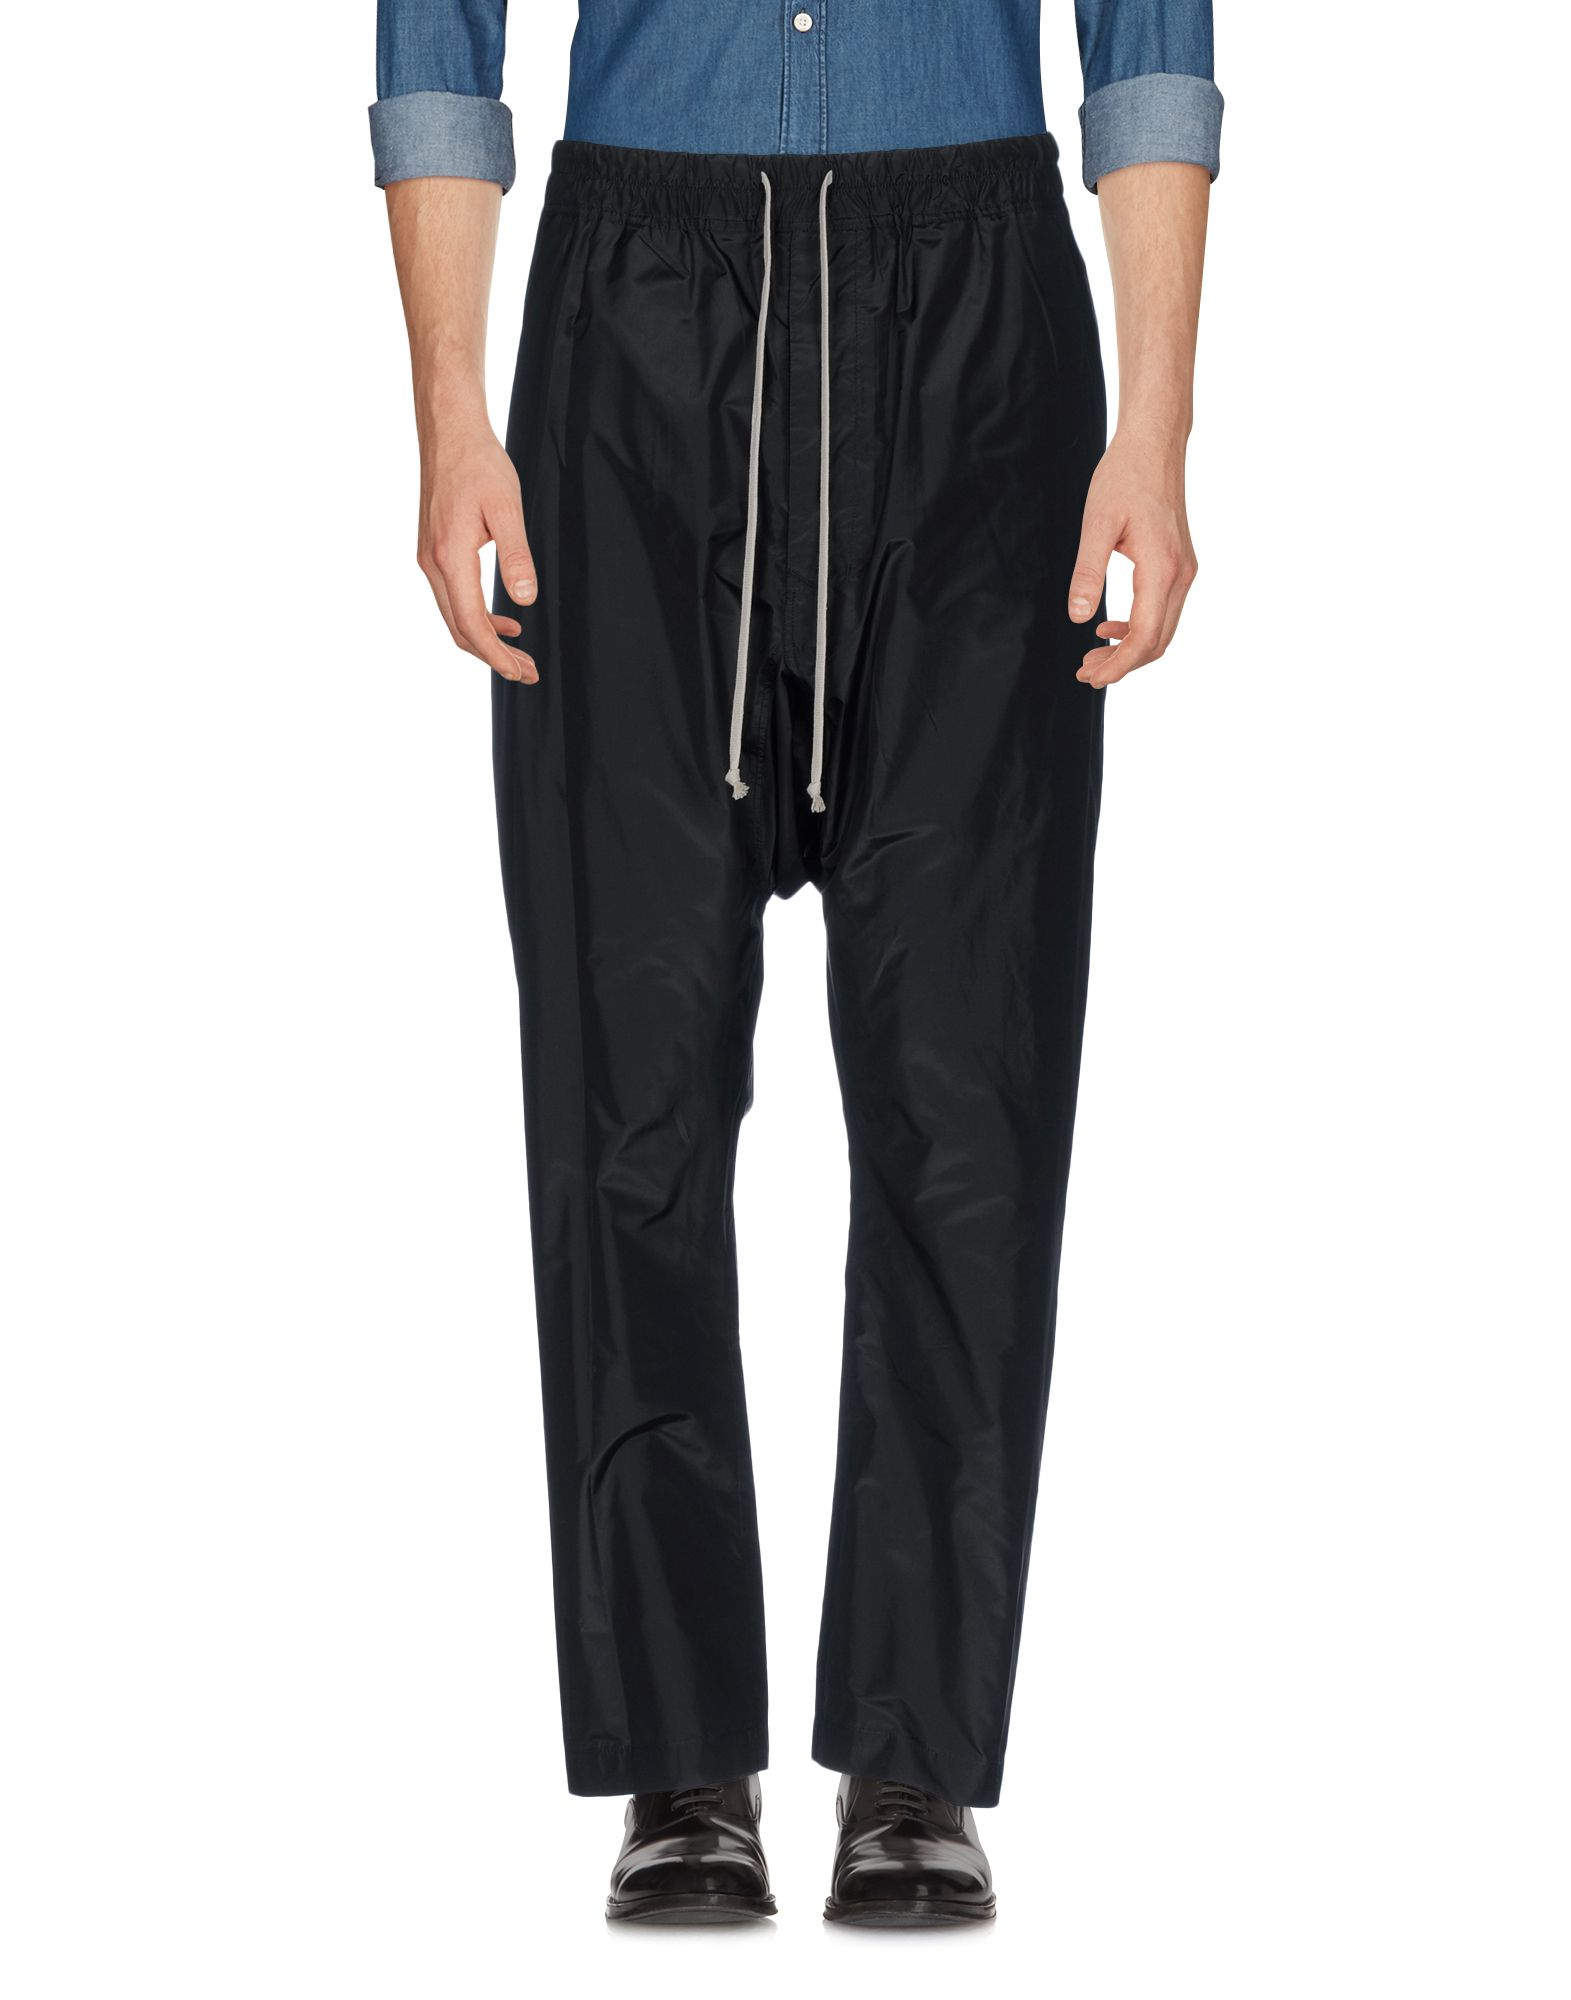 Pantalone Rick Owens Uomo - Acquista online su